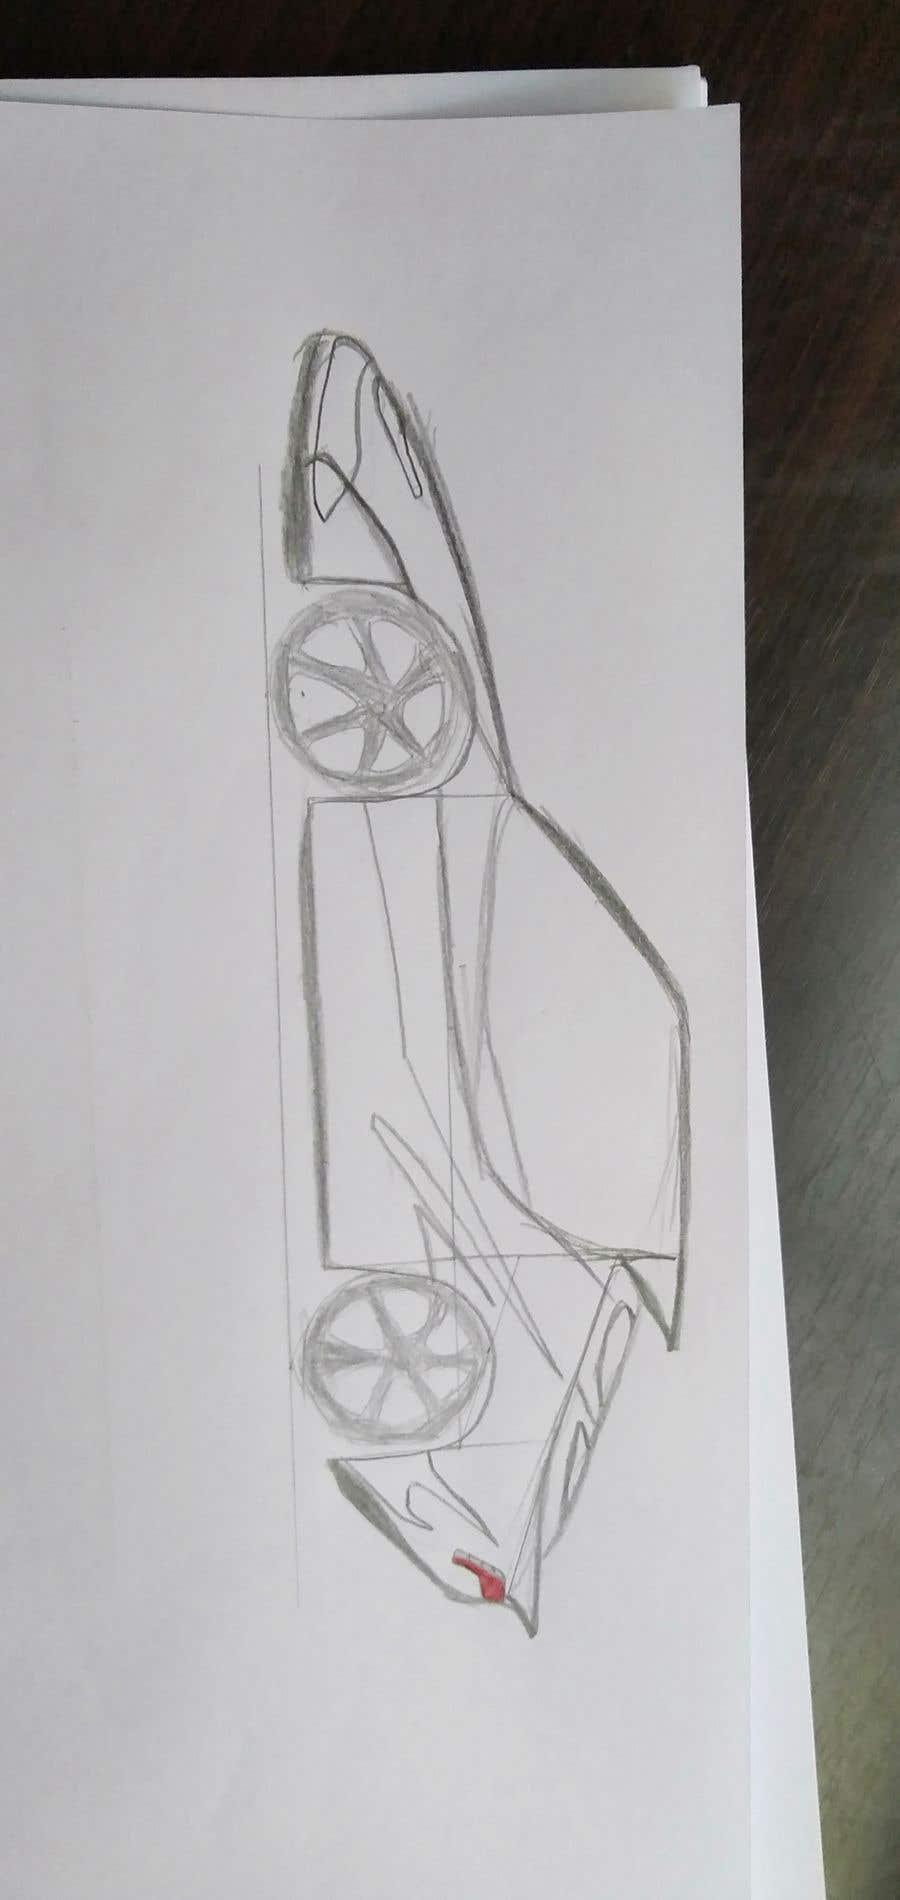 Contest Entry #                                        5                                      for                                         Design sketch for a tiny car for kids